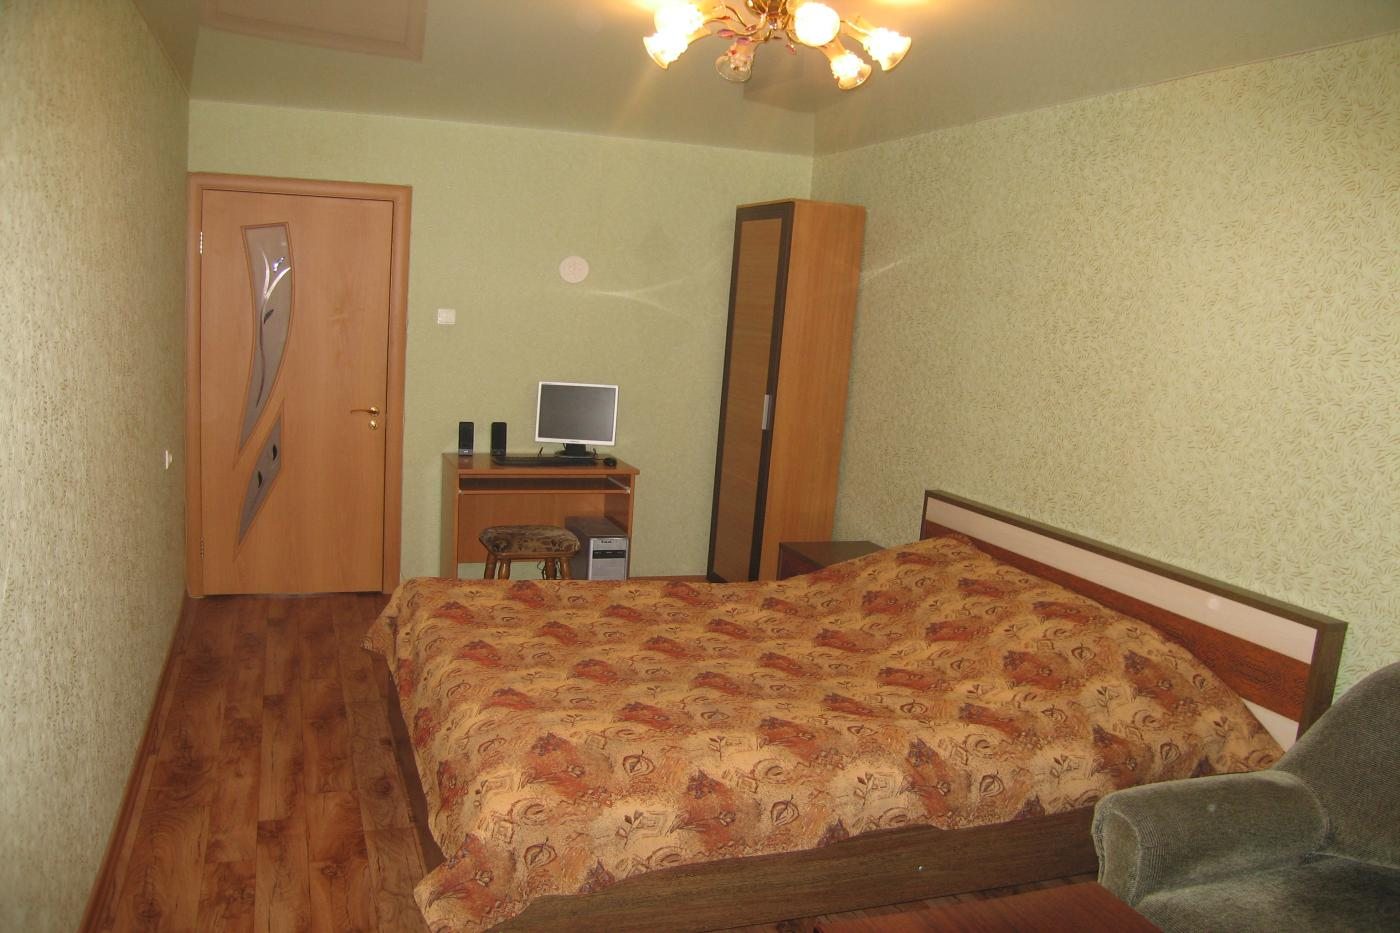 2-комнатная квартира посуточно (вариант № 2606), ул. Антонова-Овсеенко улица, фото № 9